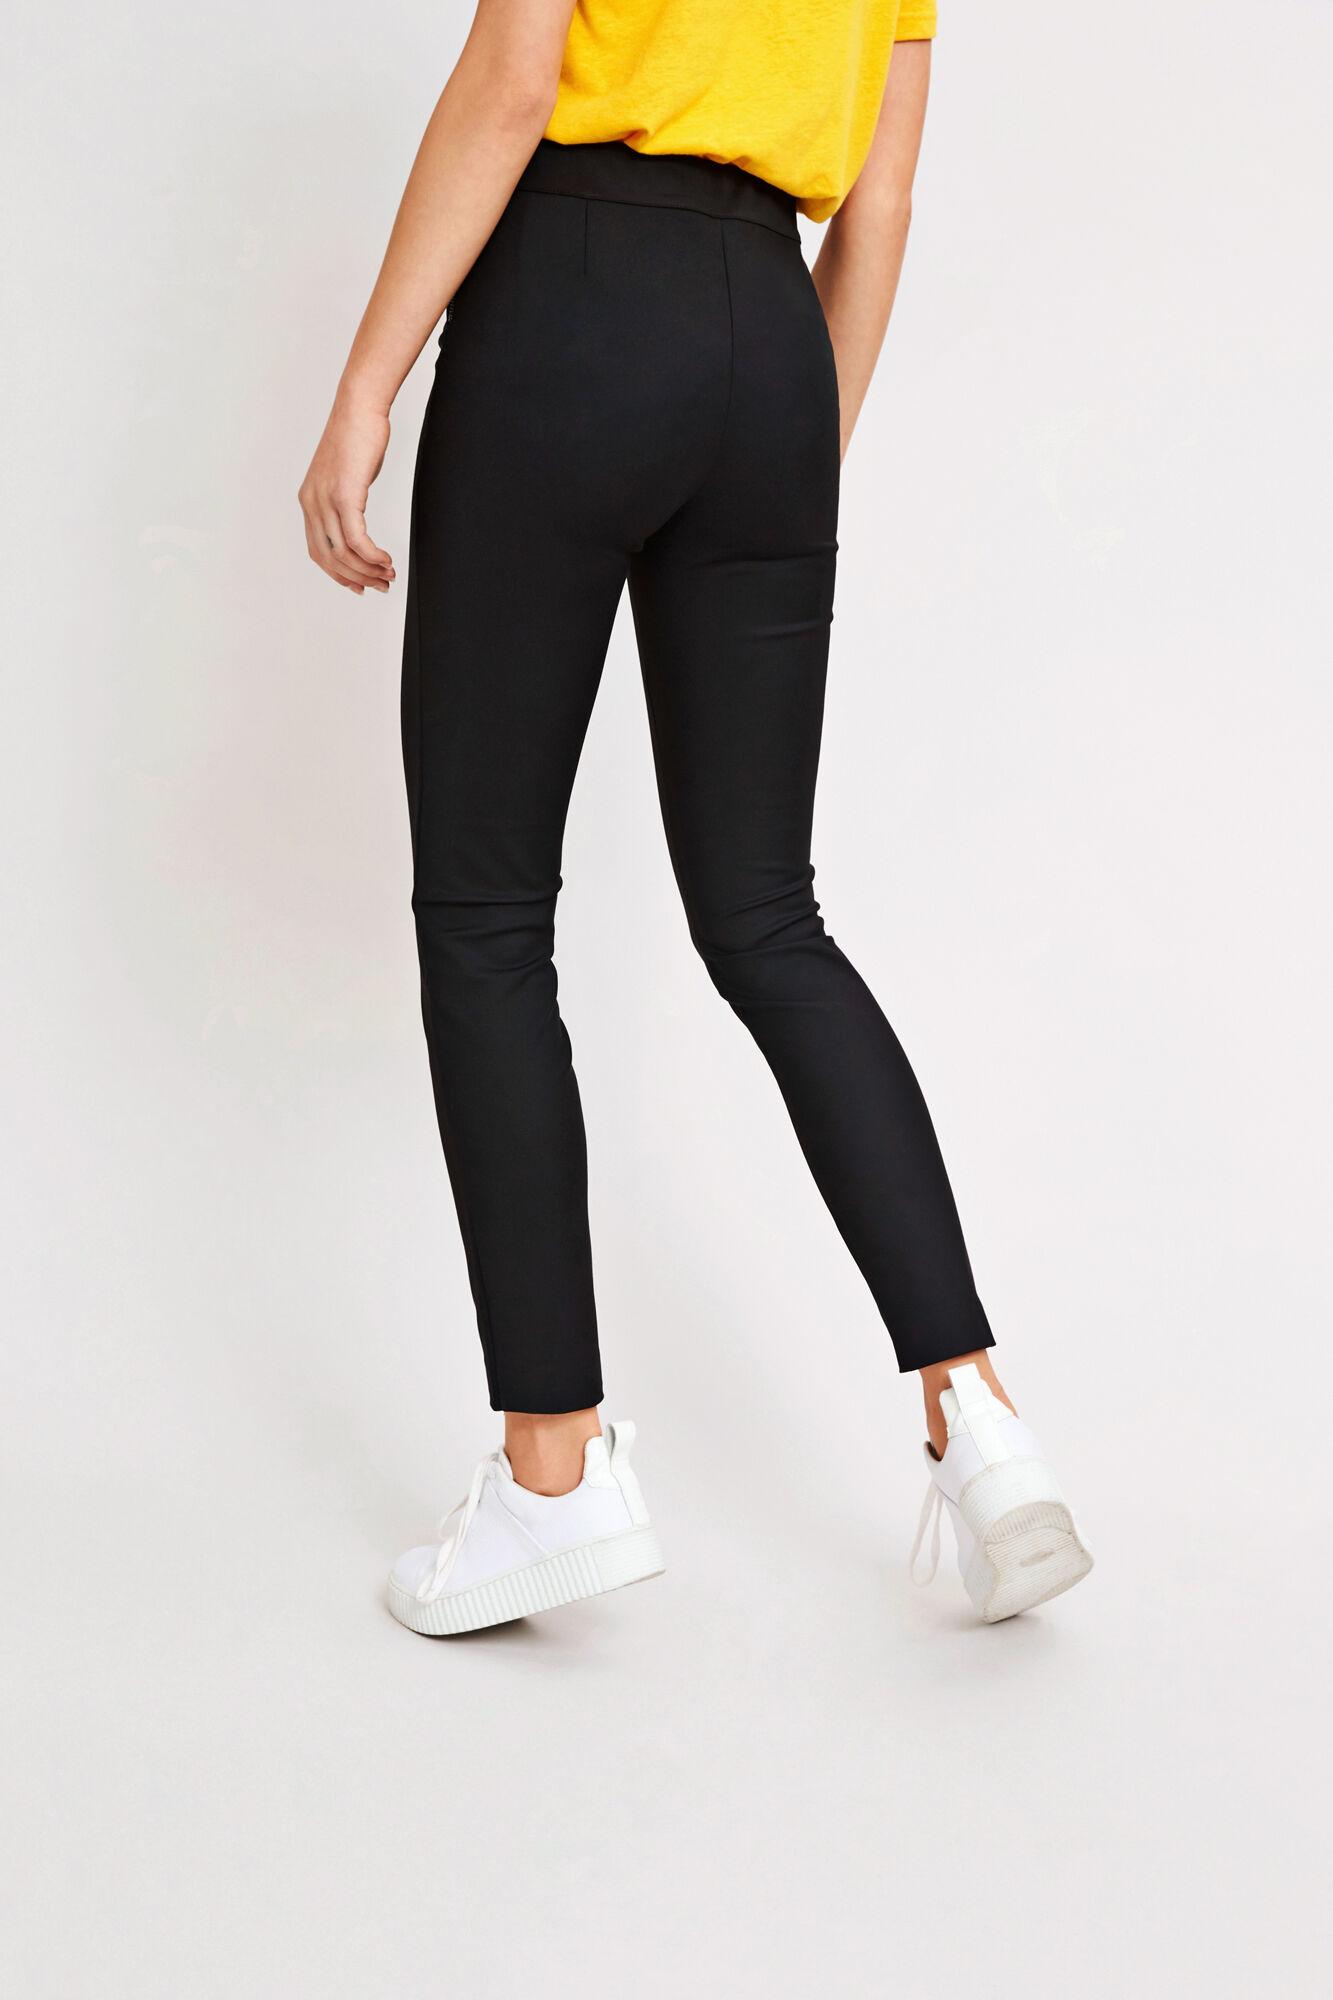 Sion pants 6272, BLACK